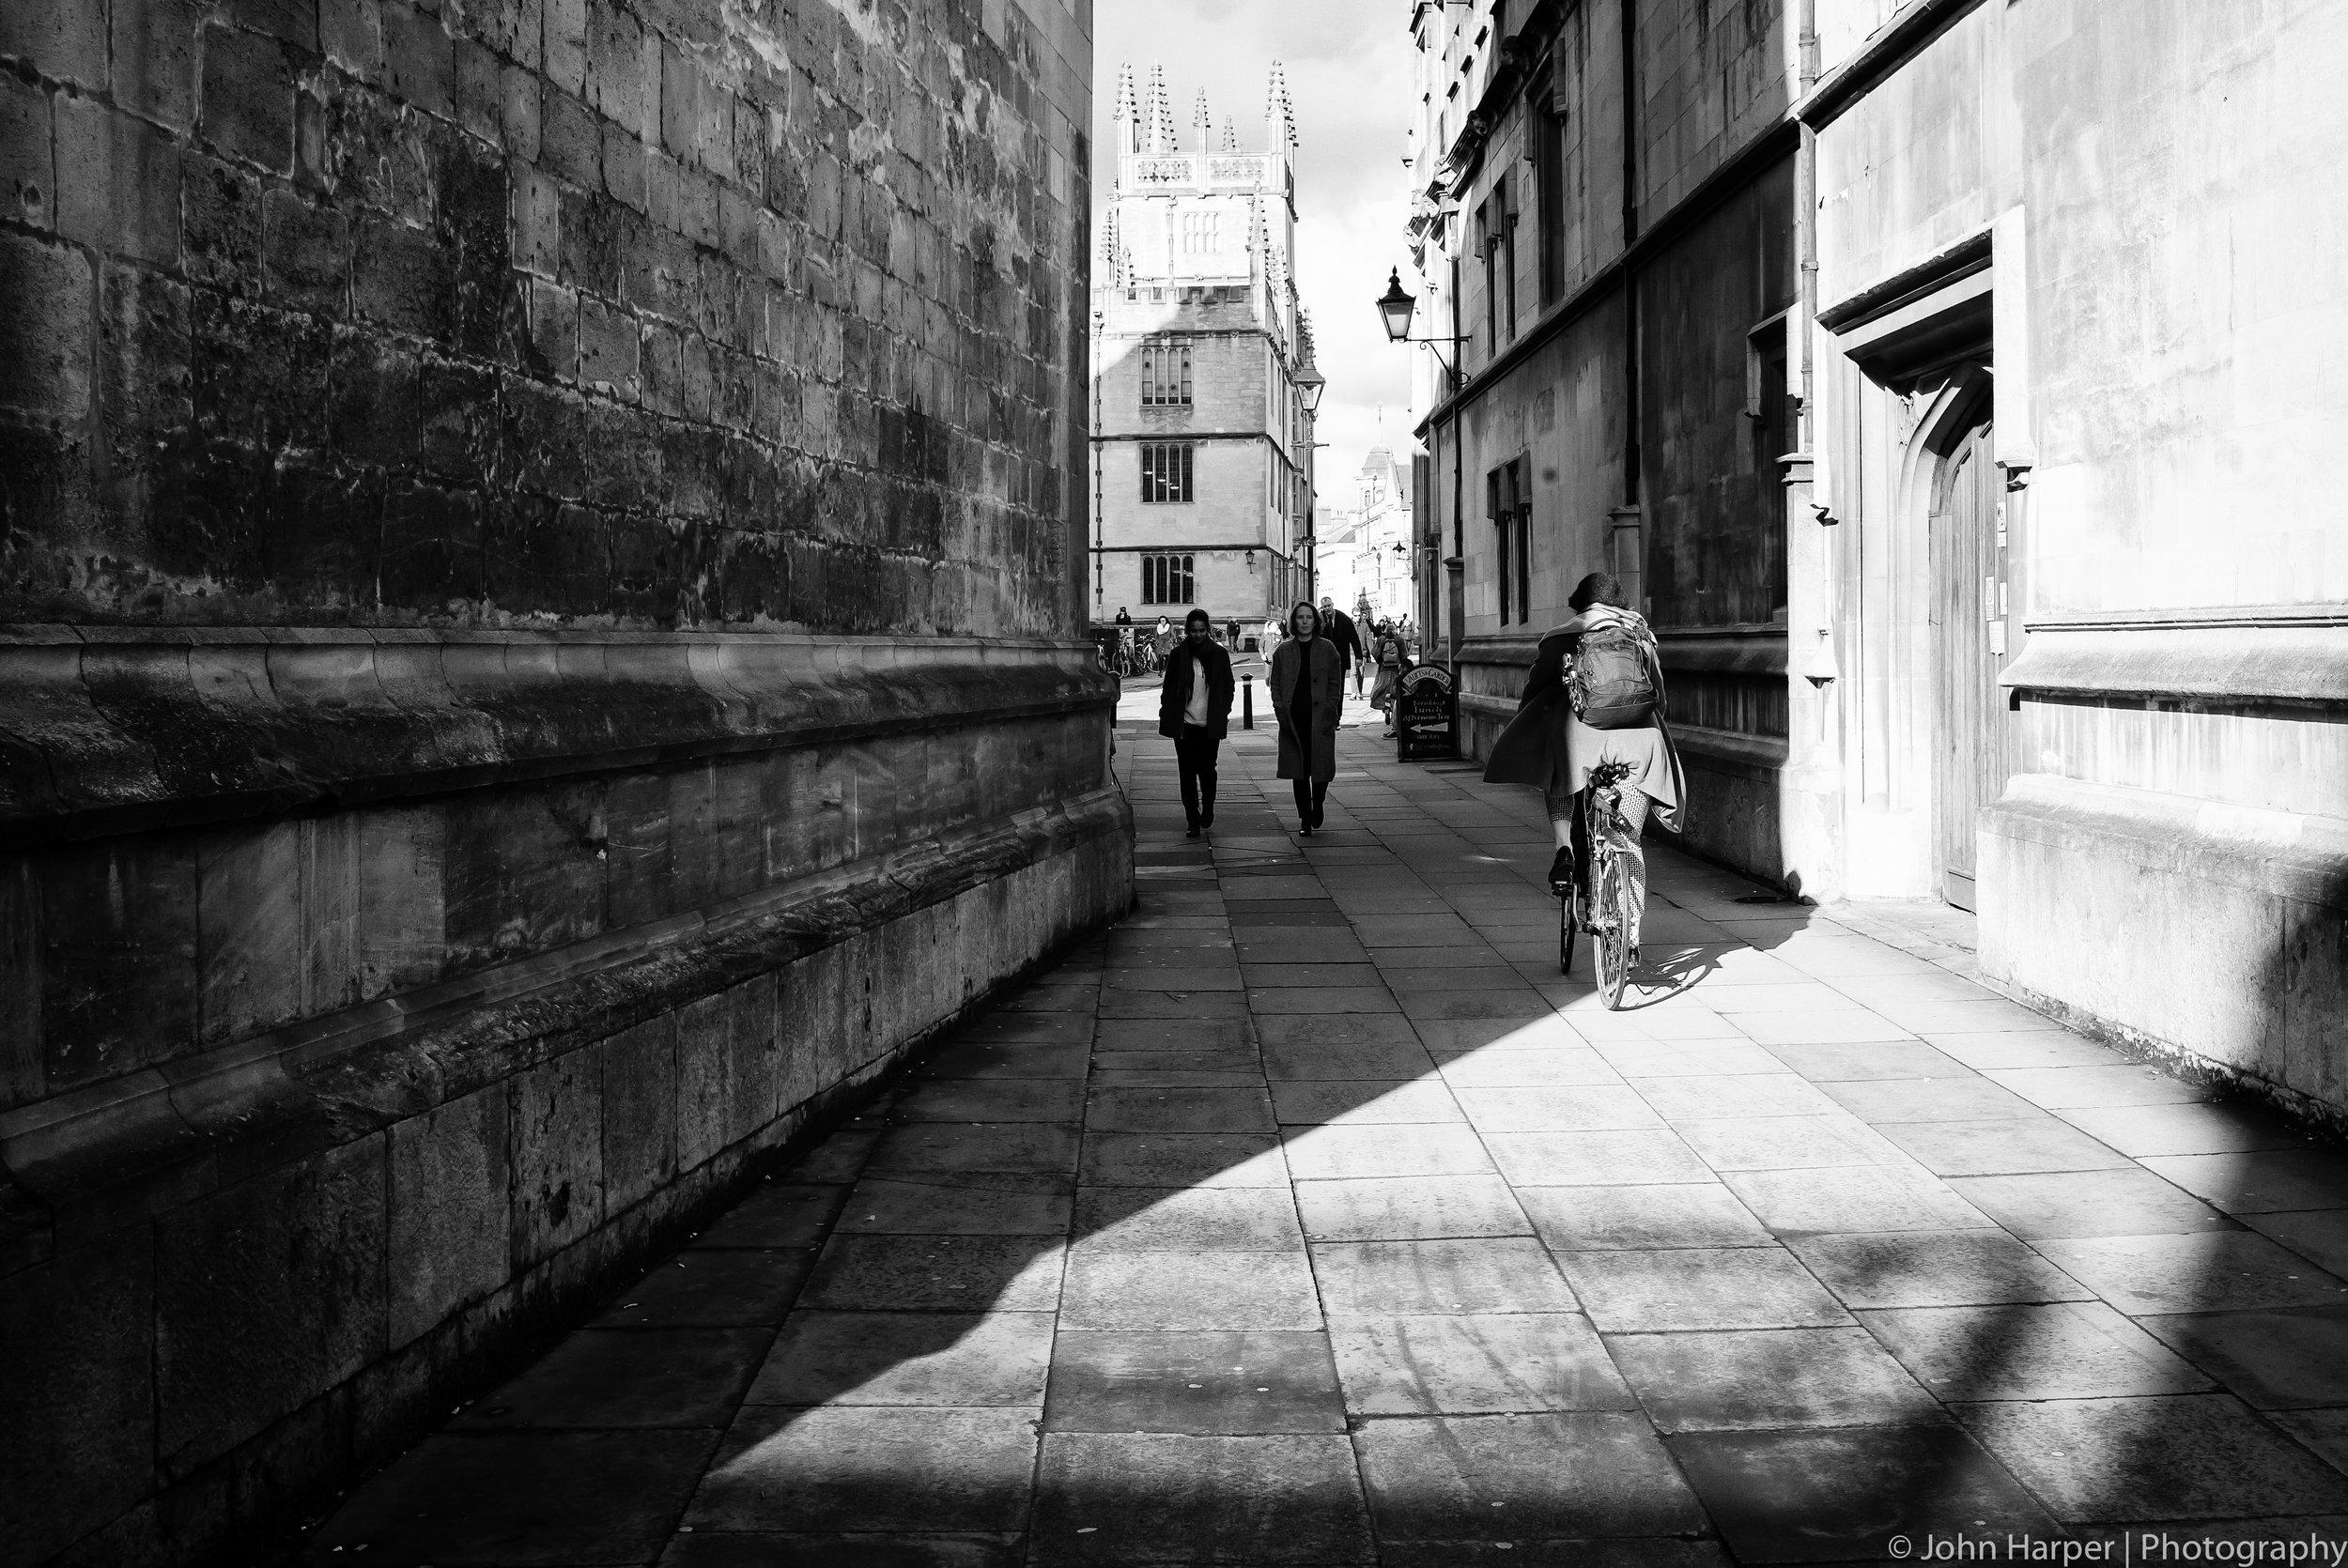 Light & Shadow & Bike